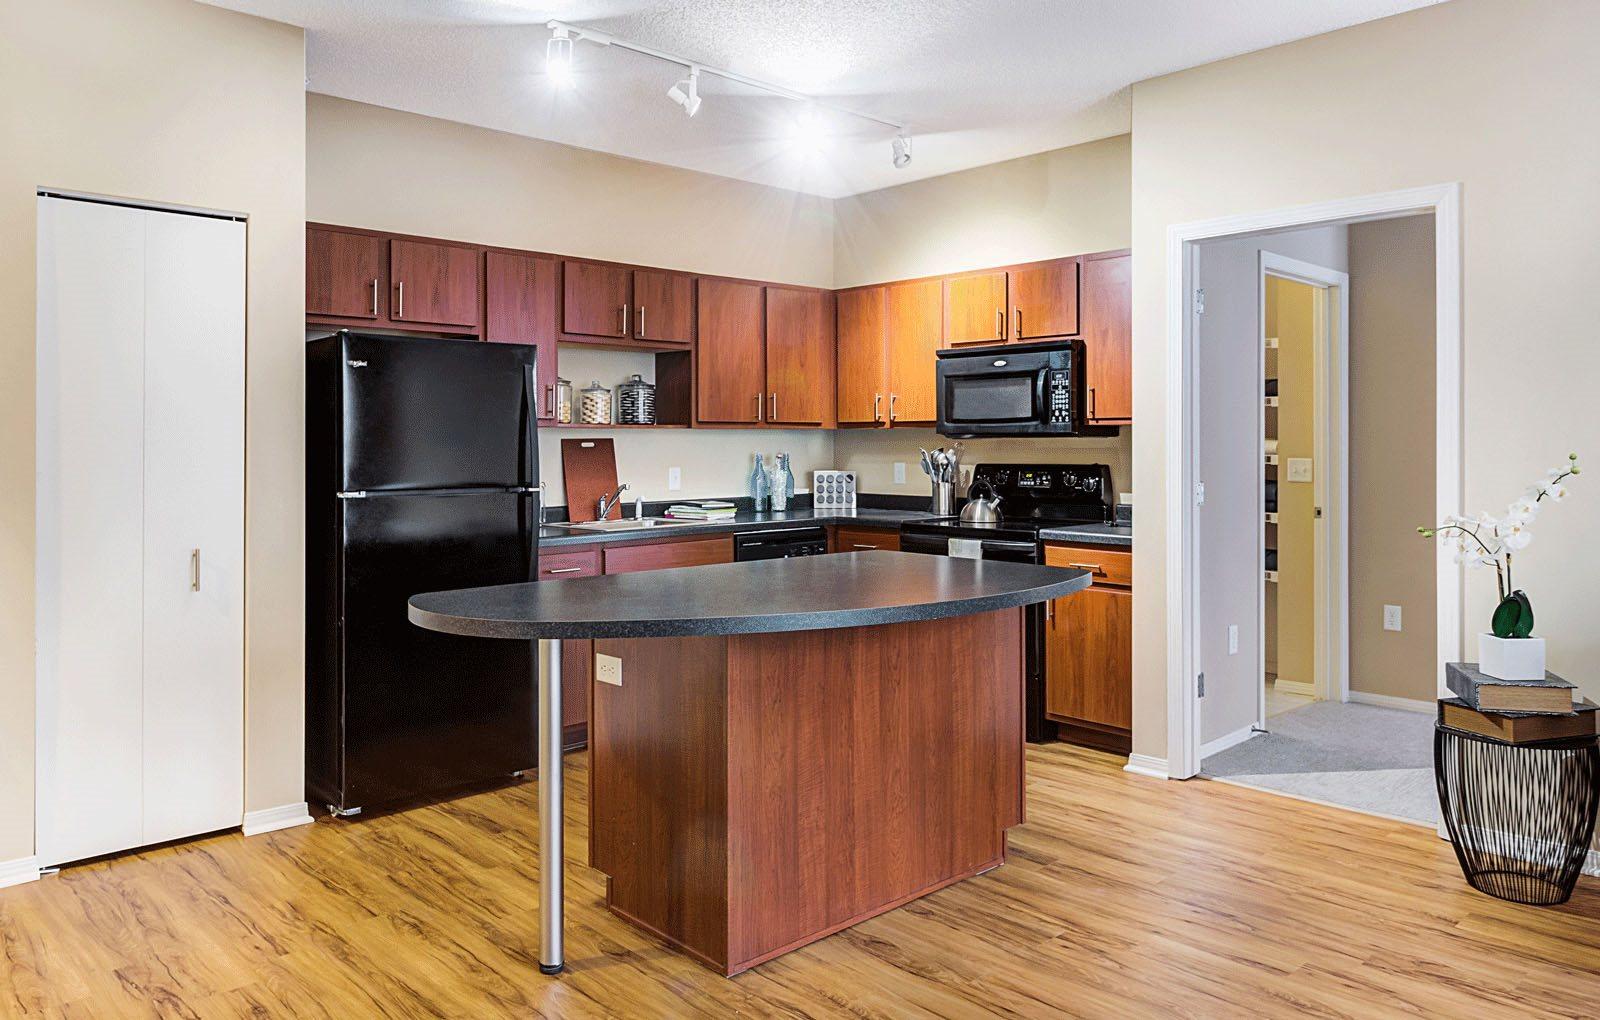 Kitchen Unit at Uptown Lake Apartments, Minneapolis, Minnesota